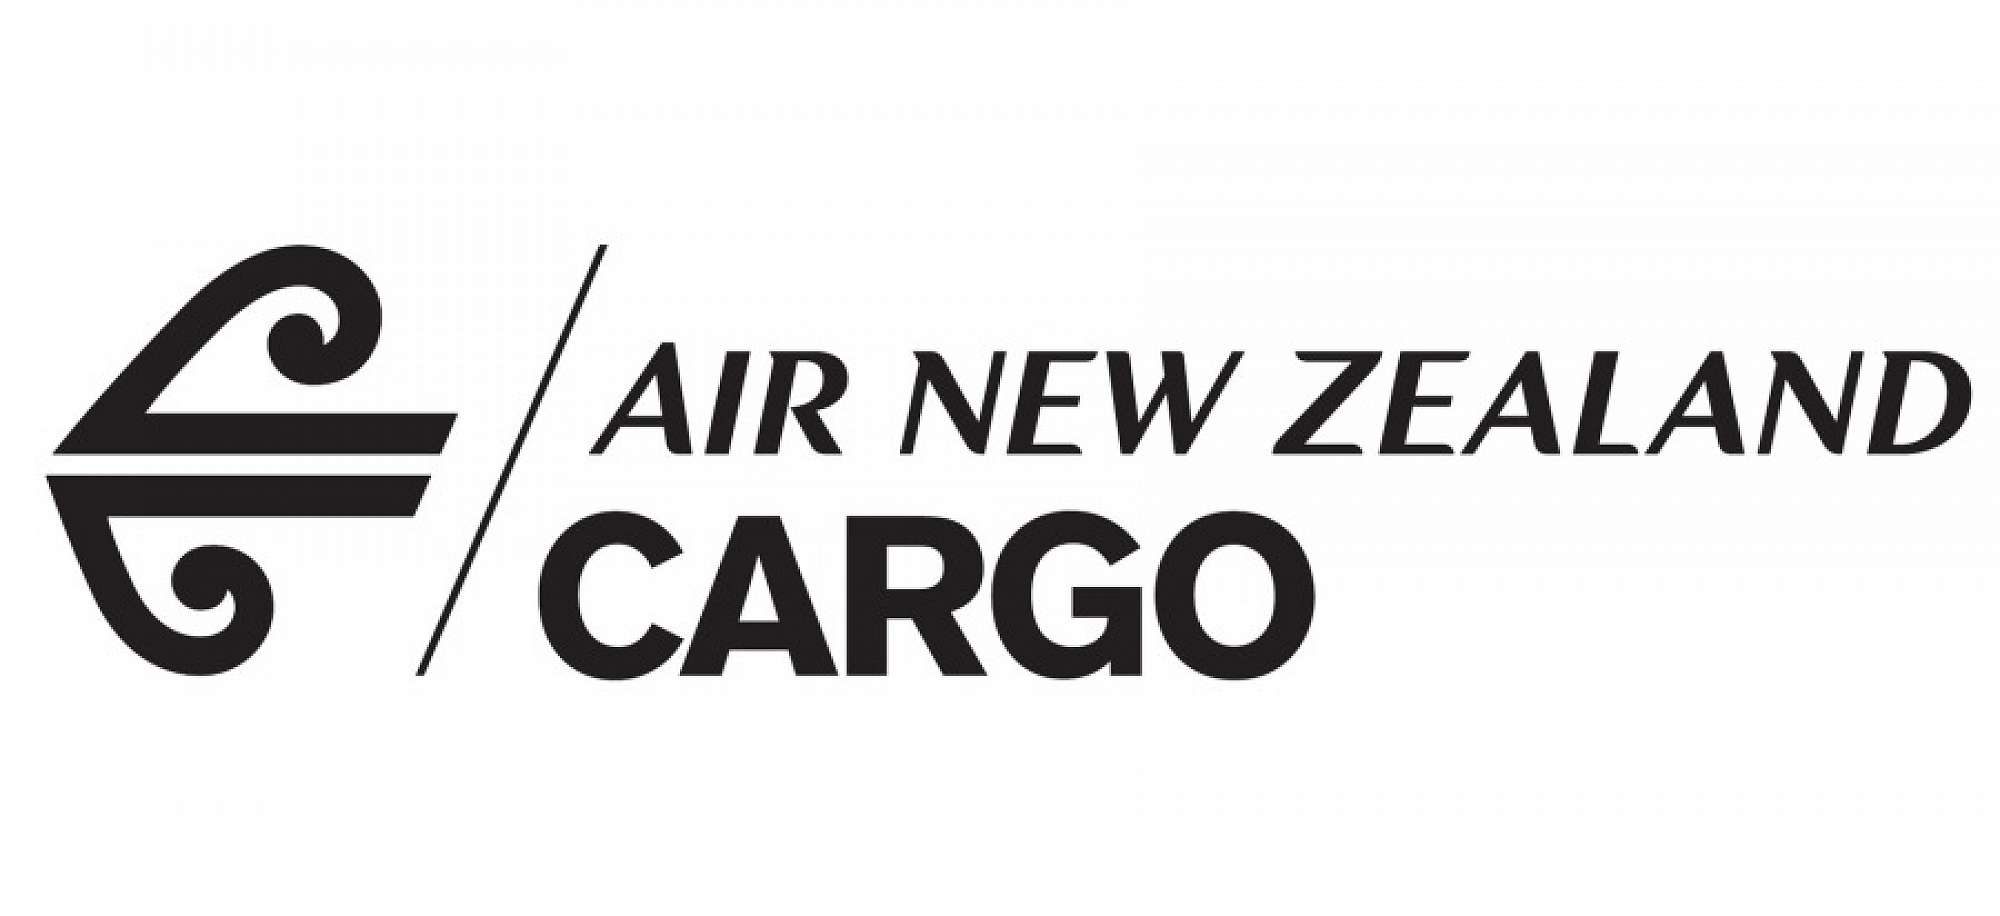 Air NZ cargo